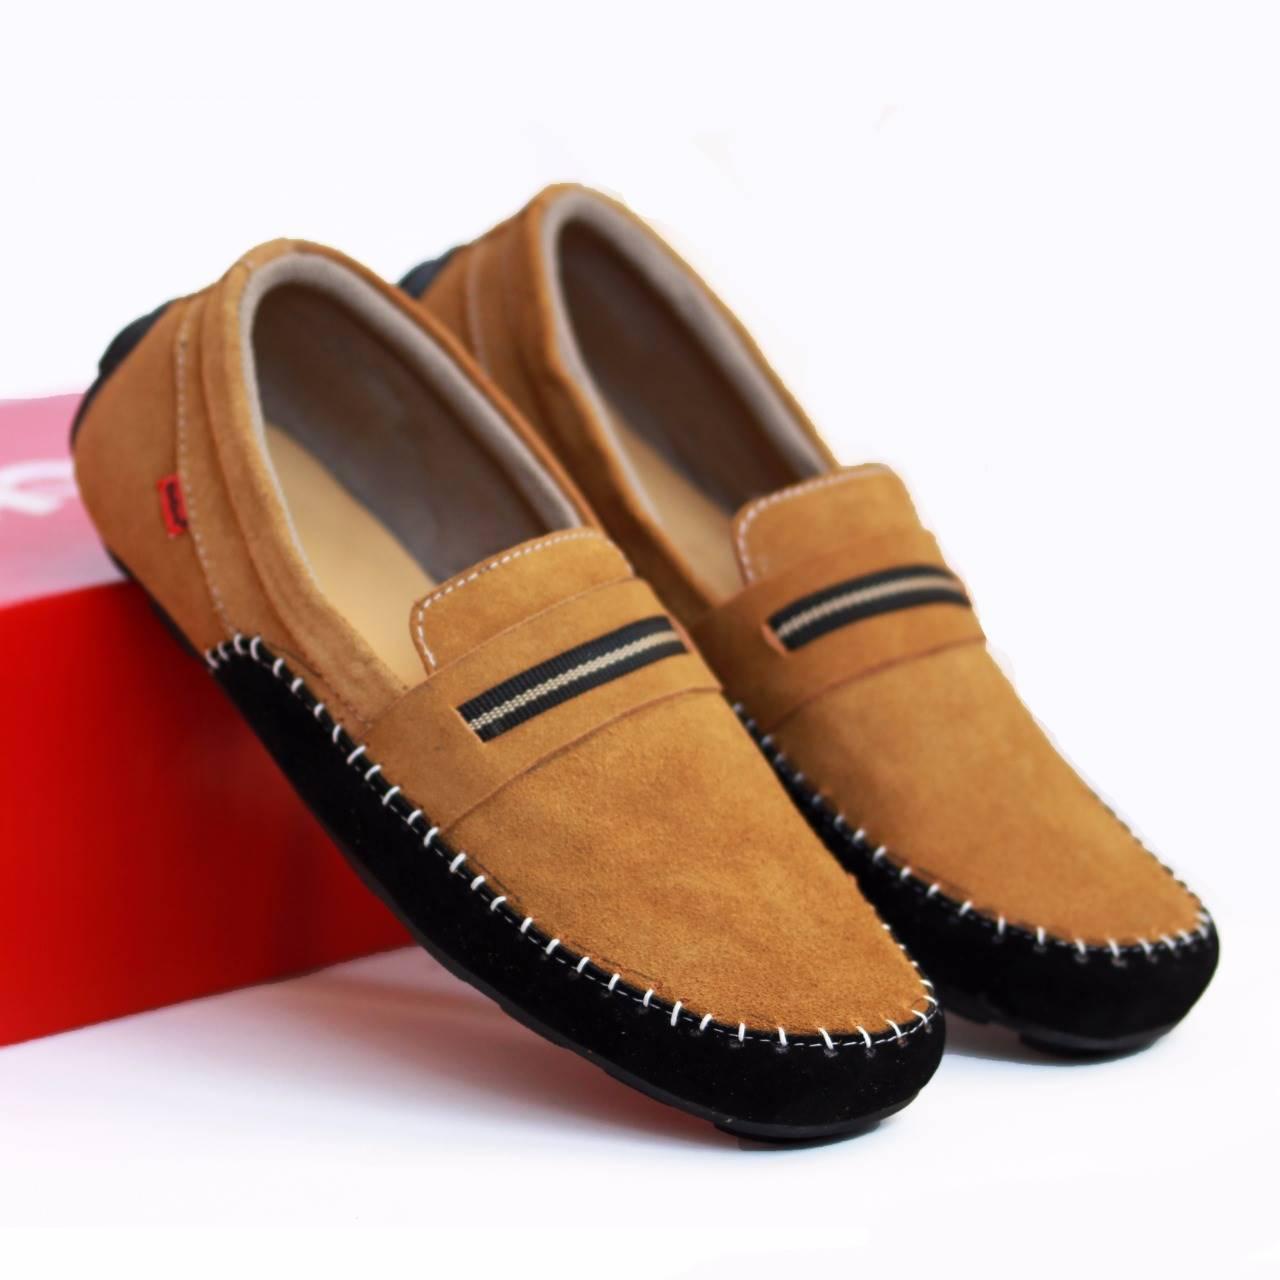 Promo Terlengkap Sepatu Kulit Pria Casual Asli Wanita Pantofel Slip Cepc Cocoes Kickers Corsa Suede On Formal Kerja